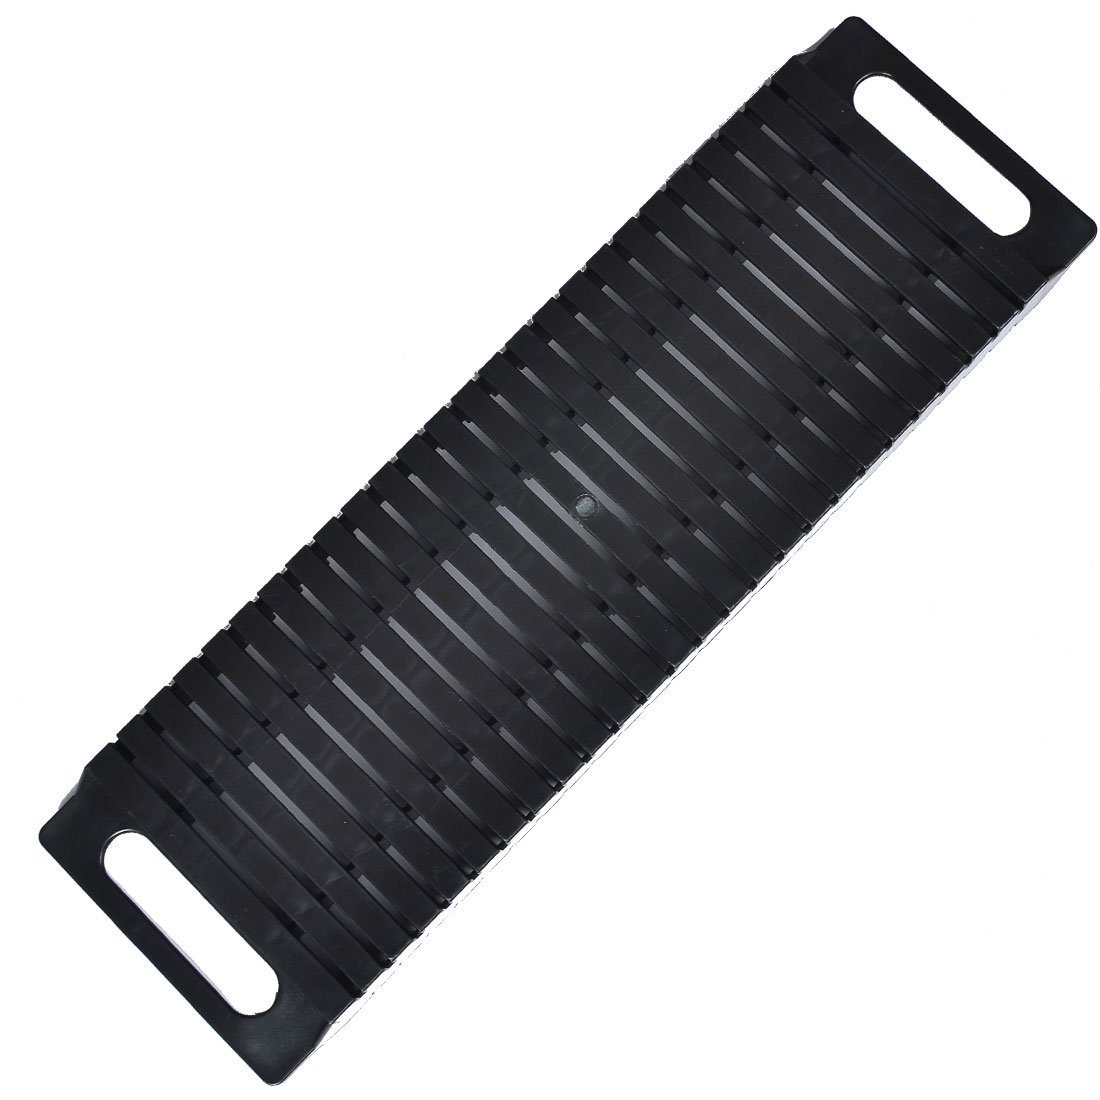 Antistatic ESD Circulation Rack Shelf - Sanbo Black Rack with Plastic Material 47 x 14 x 3.5cm